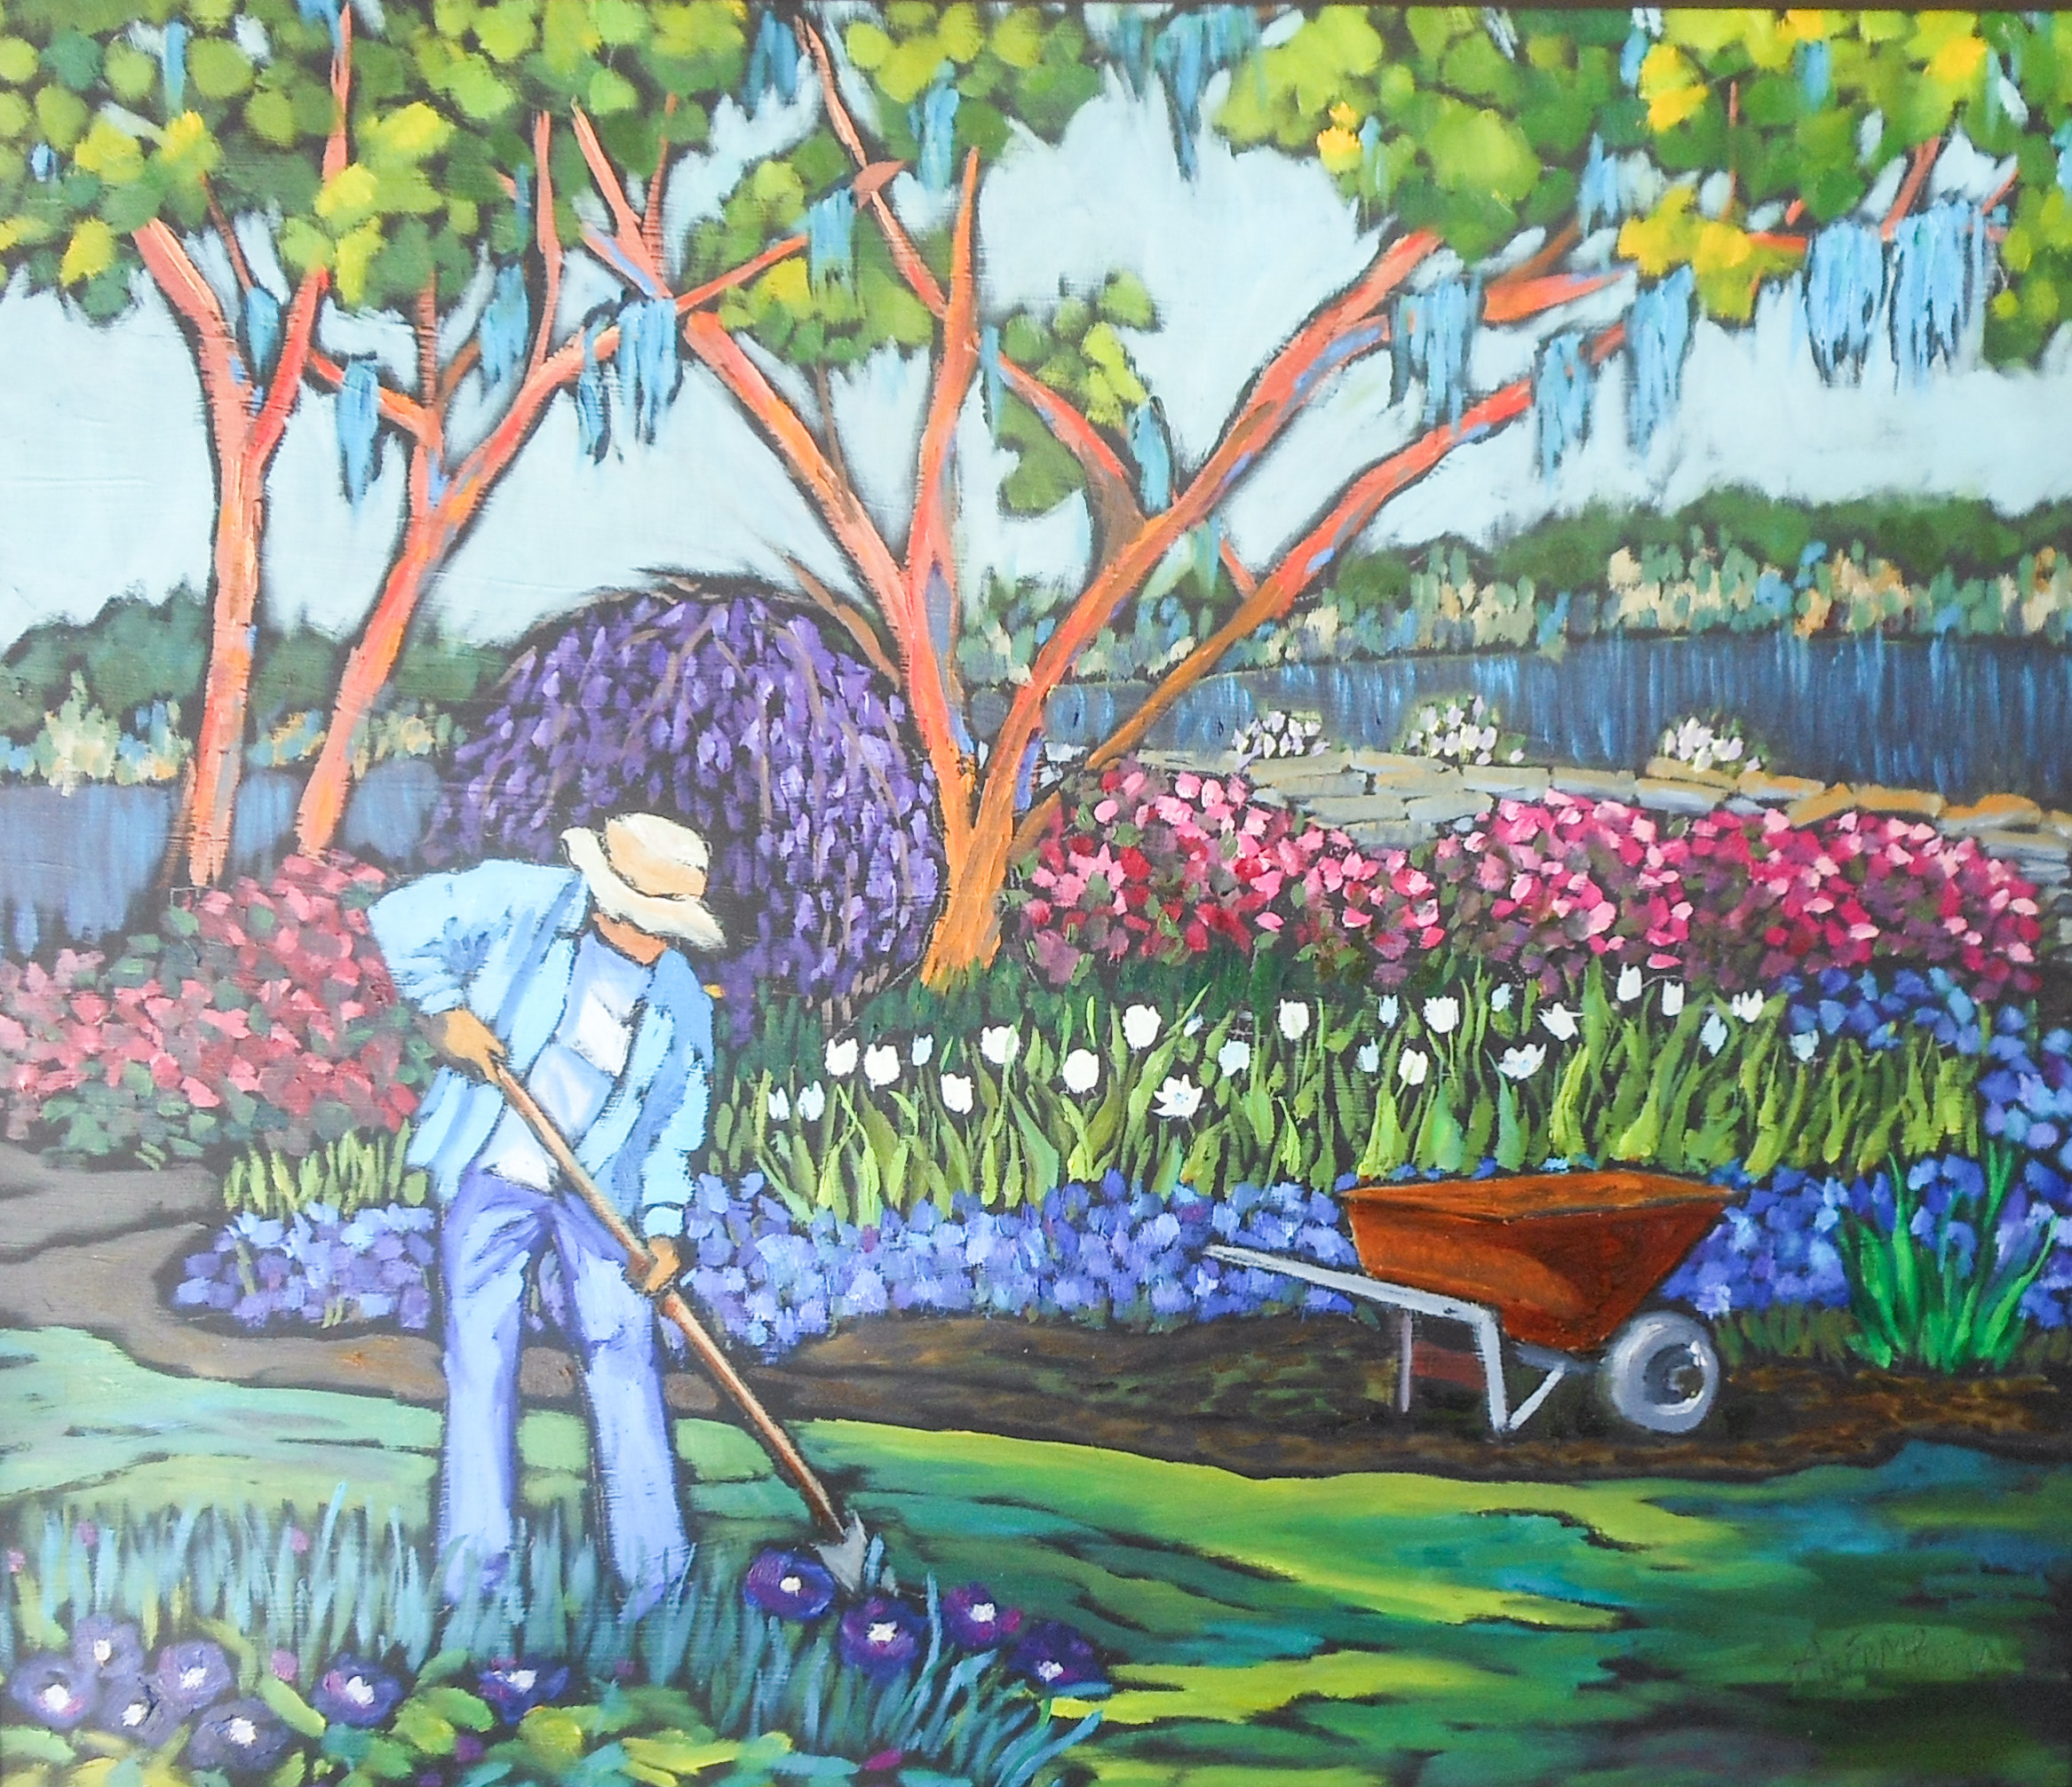 The Gardener at Work